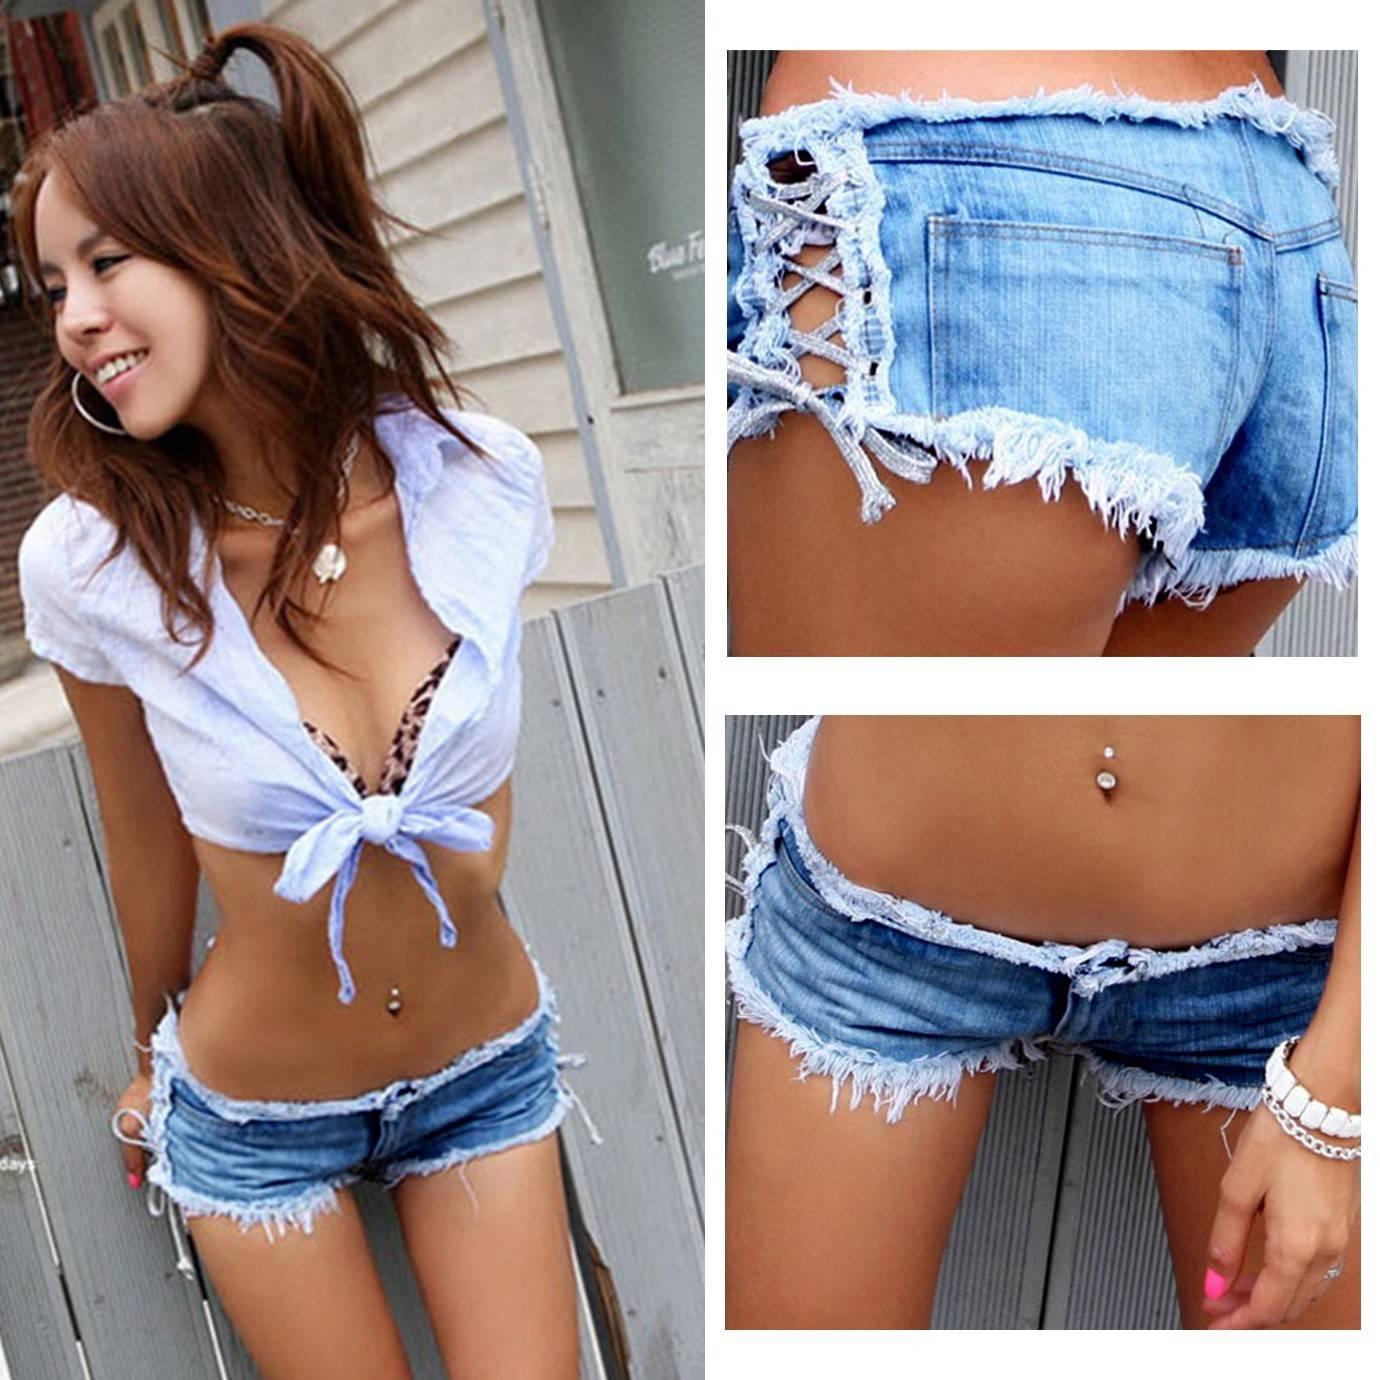 Sexy Women In Hot Pants 3